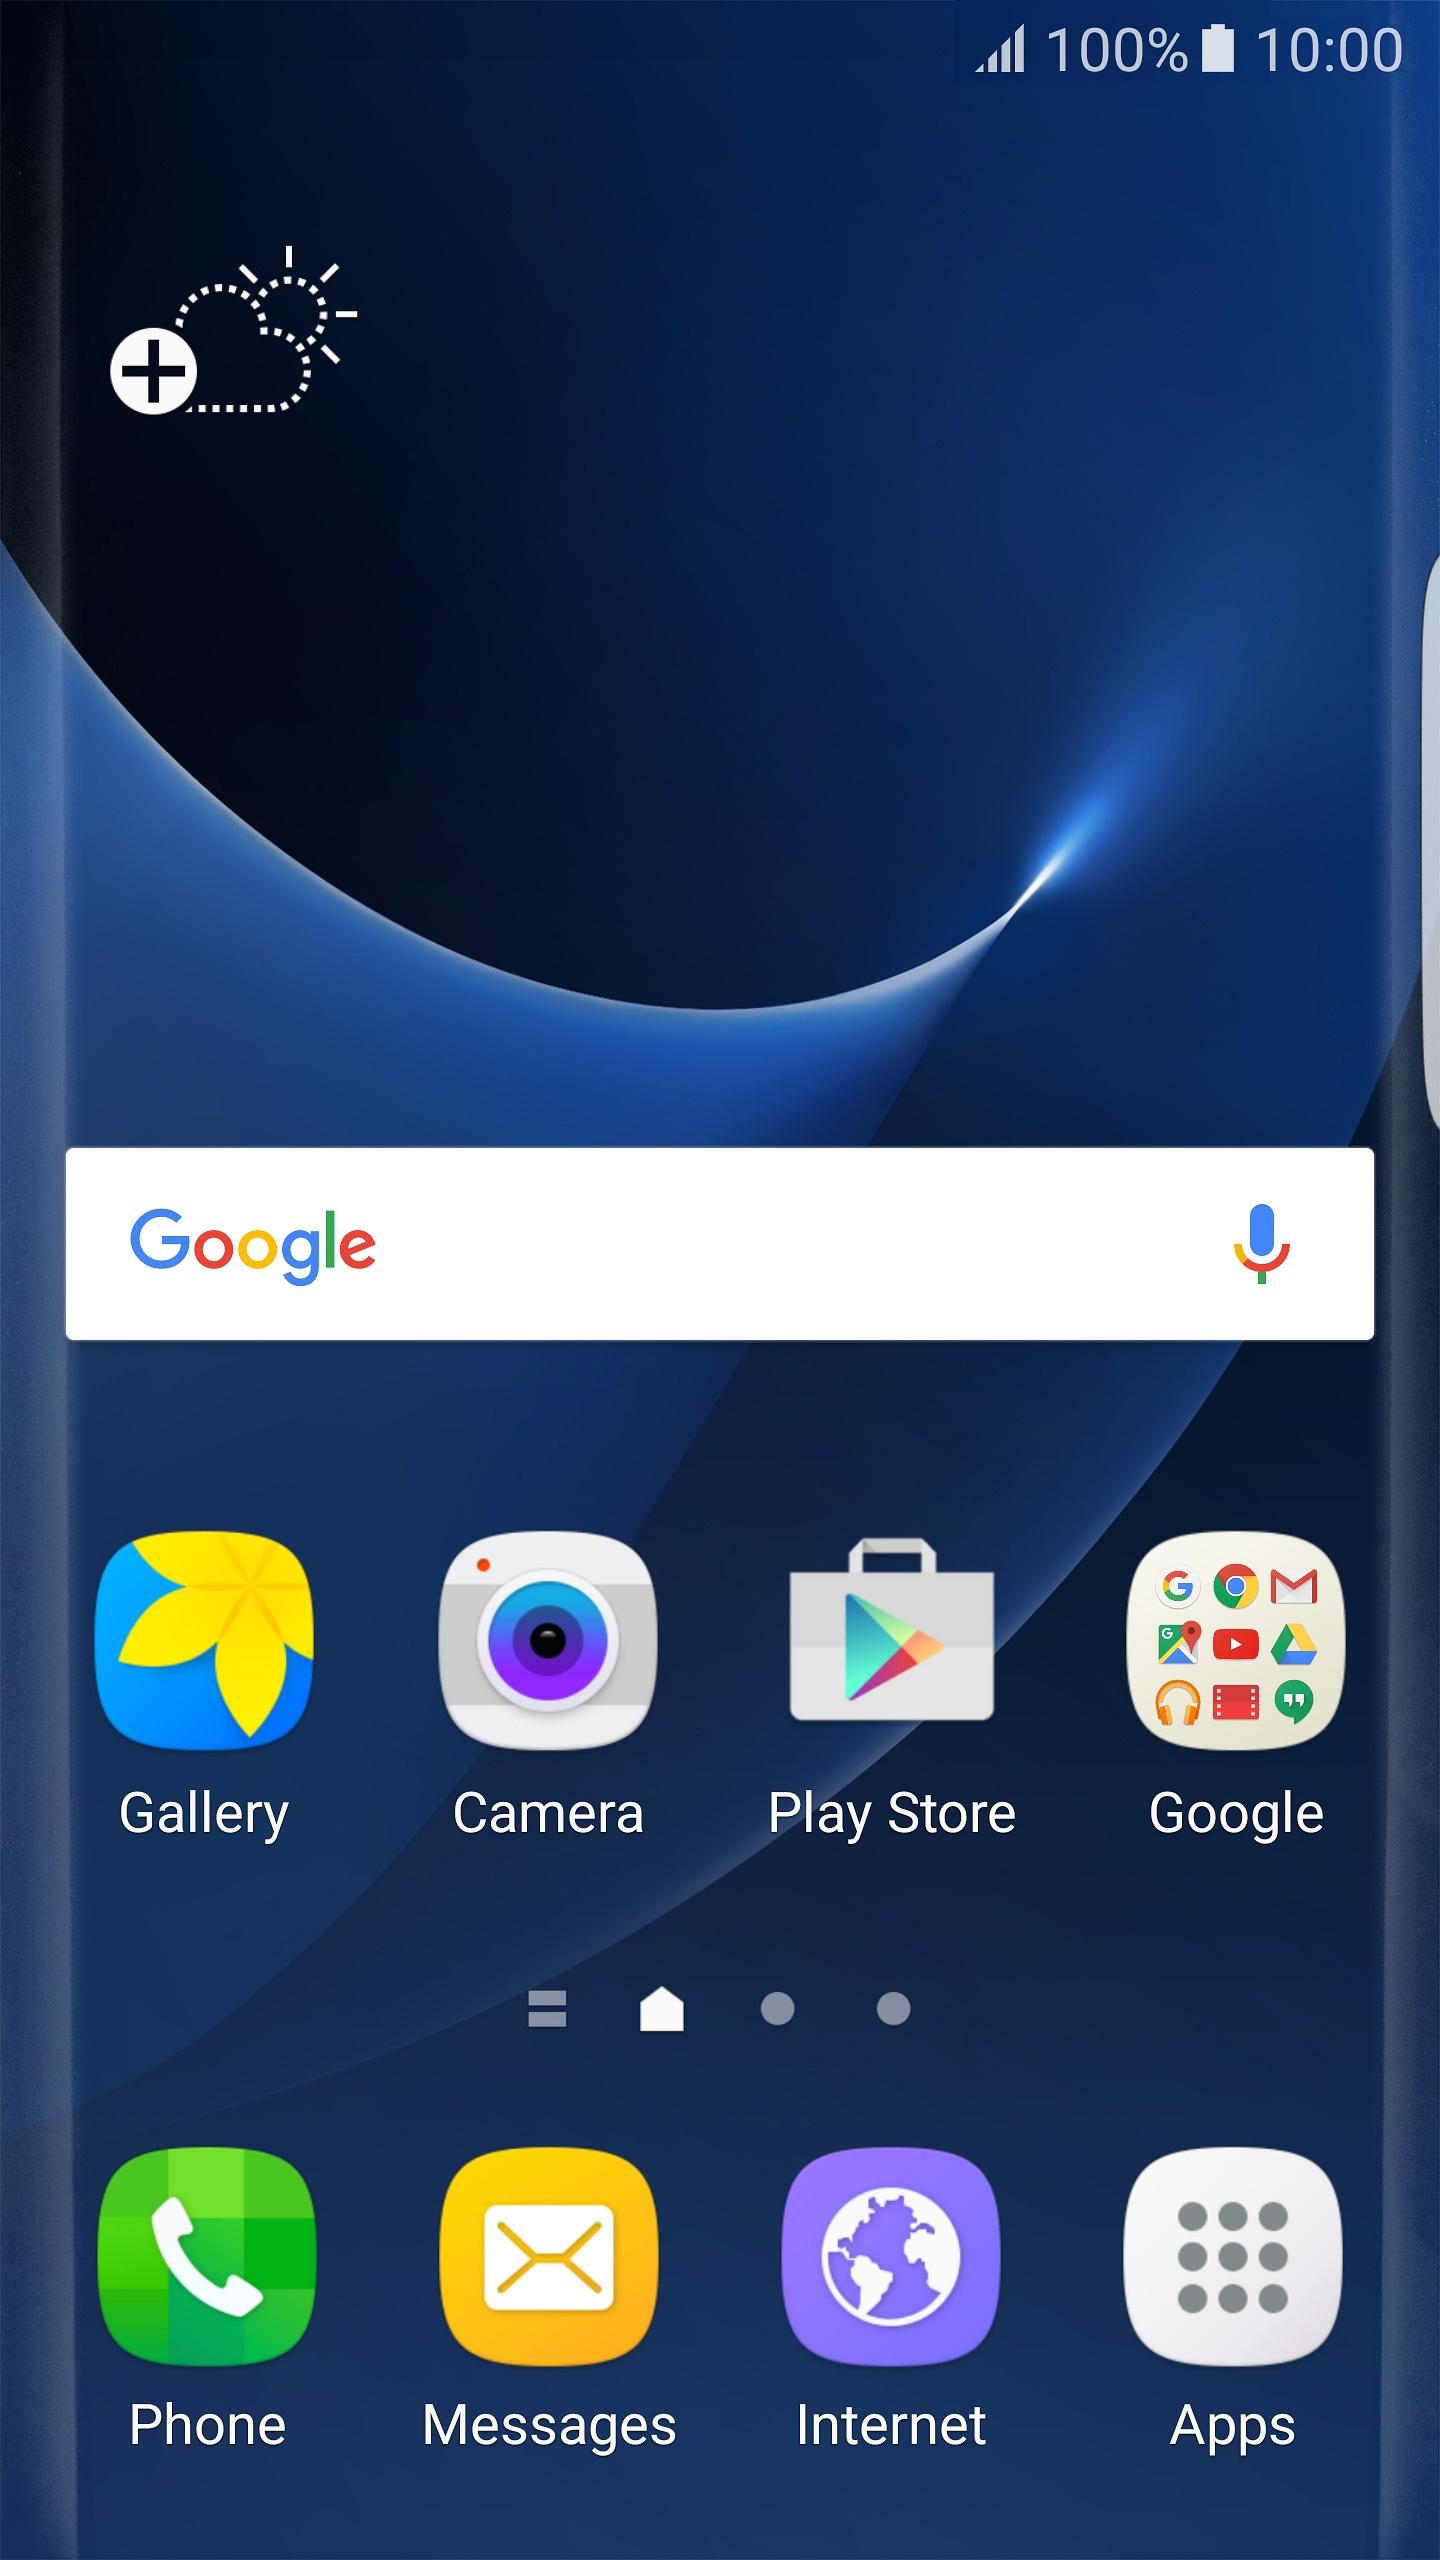 List of screen icons samsung galaxy s7 edge android 60 telstra list of screen icons biocorpaavc